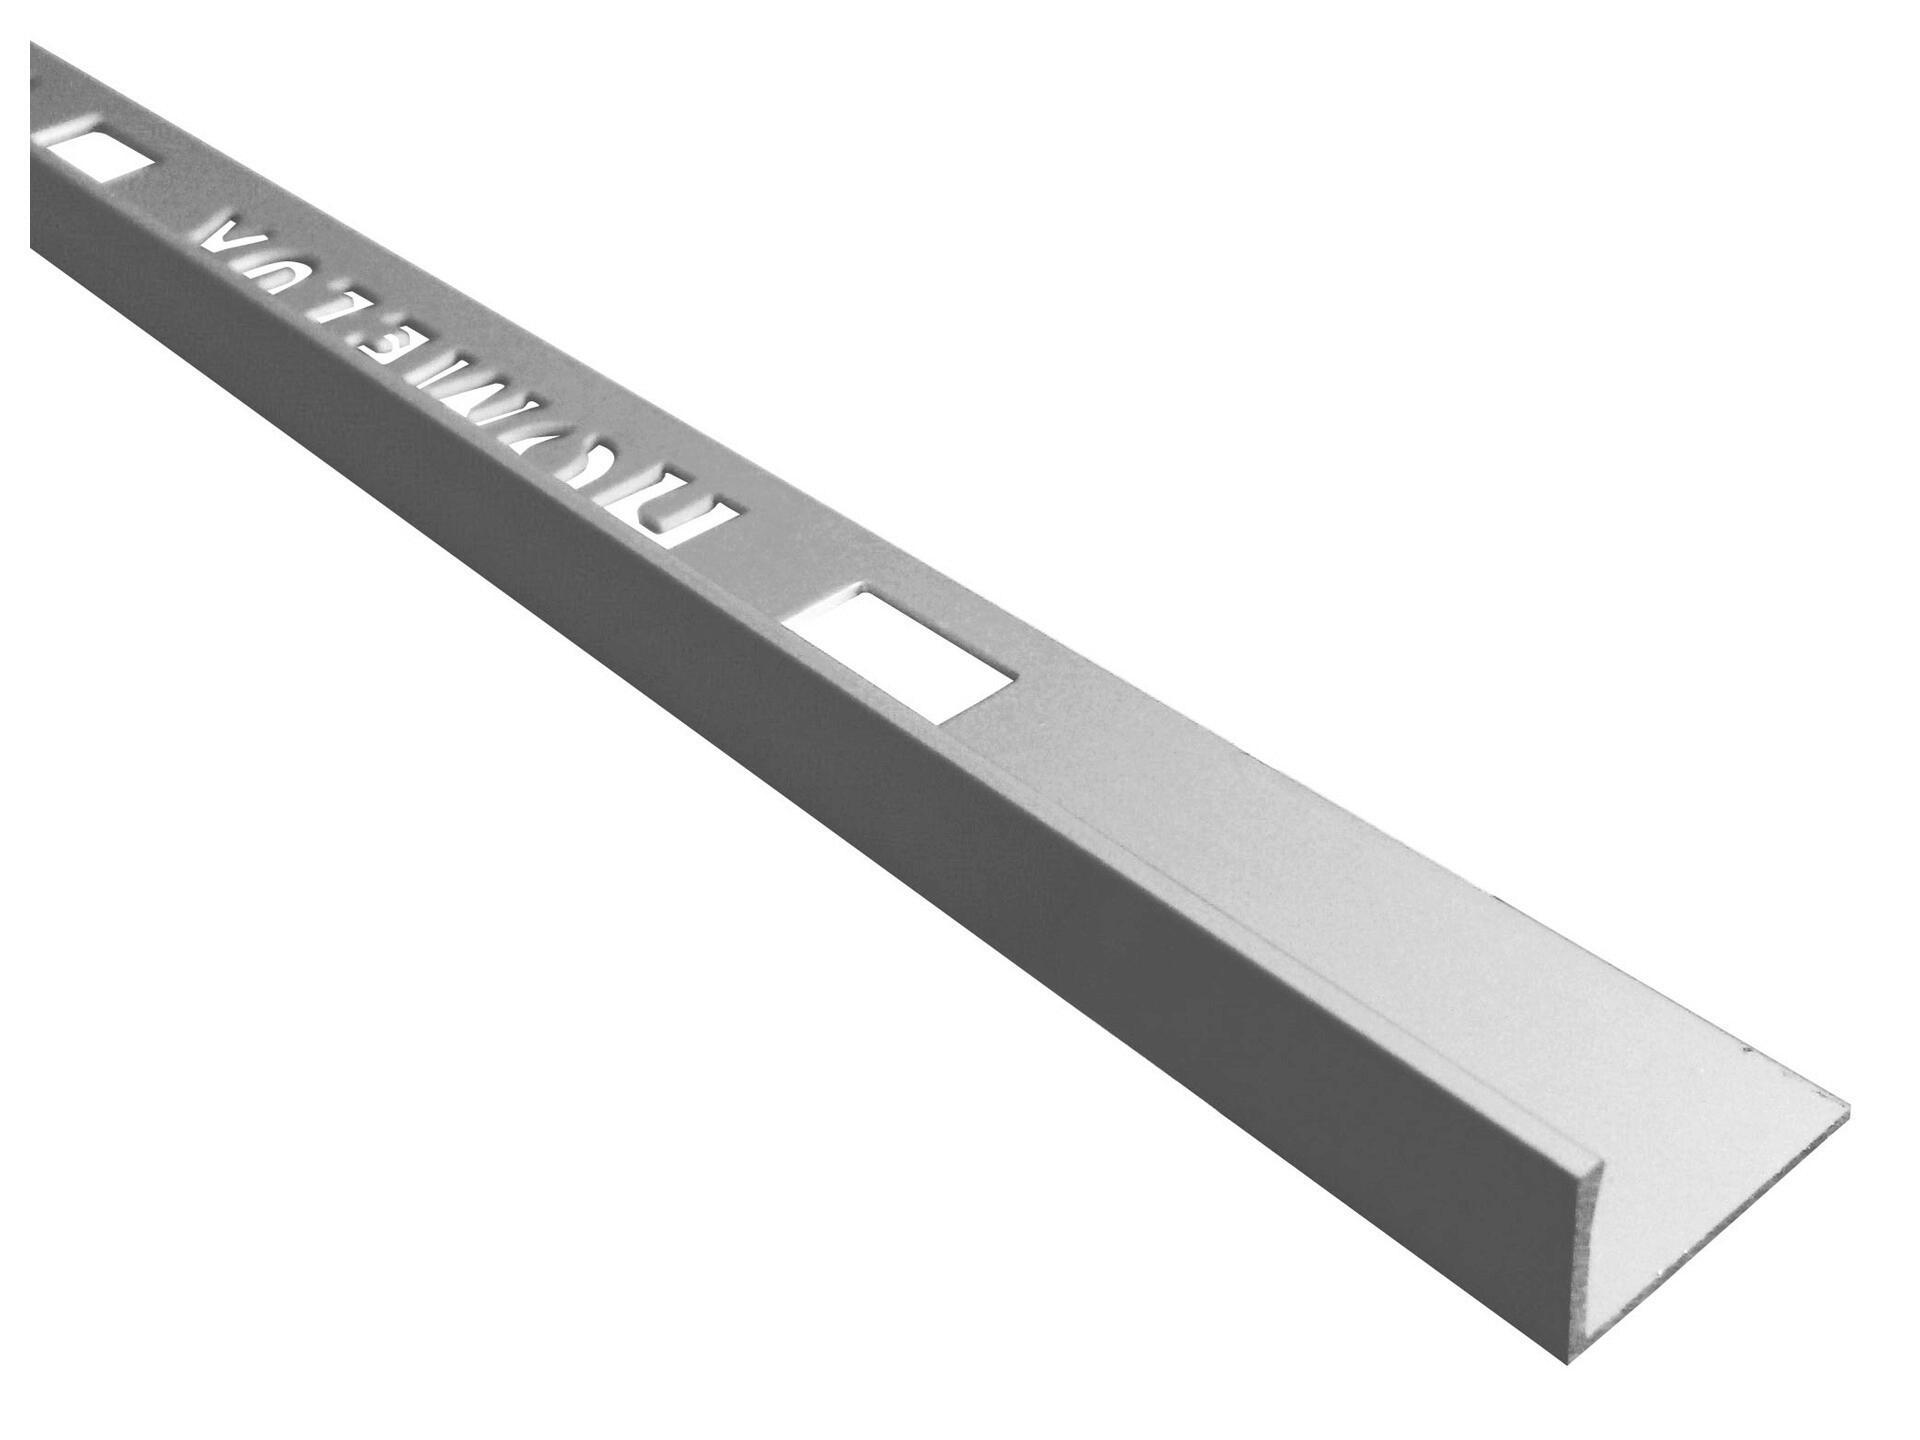 Homelux Profil De Carrelage Droit 11mm 120cm Aluminium Mat Argente Hubo